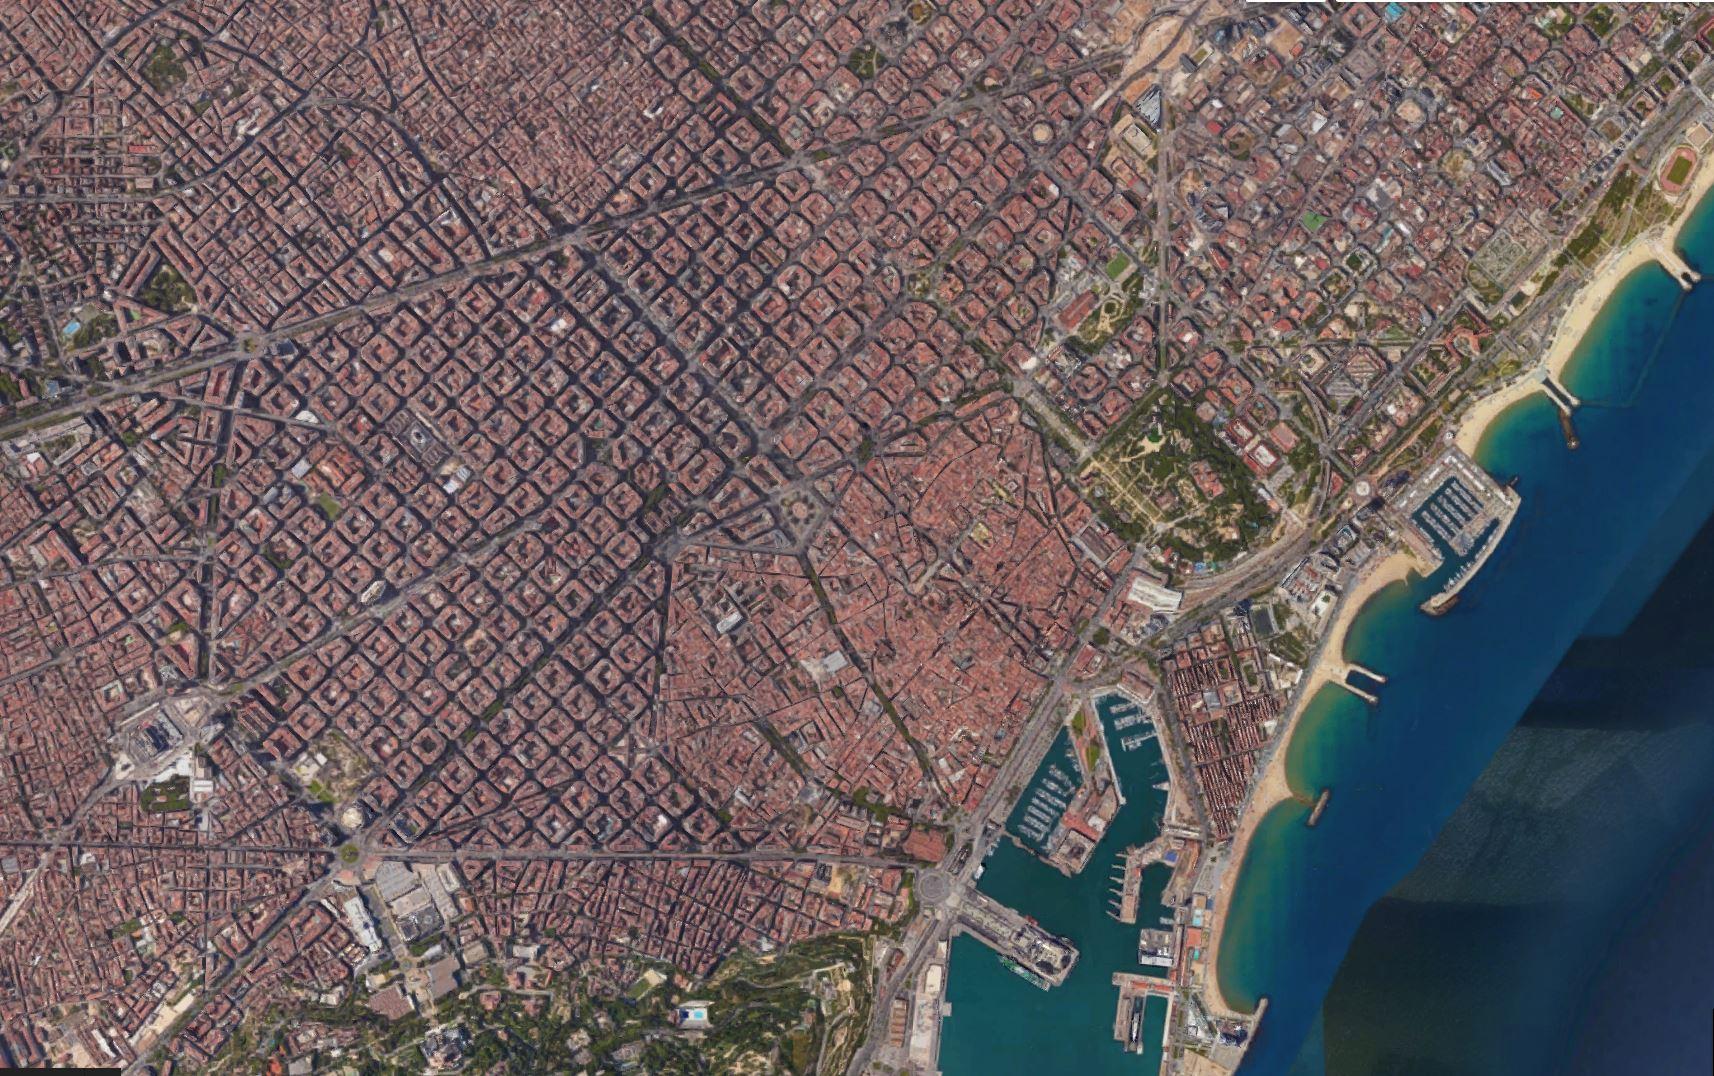 barcelona תכנון עירוני בברצלונה. בלוג רונית כפיר